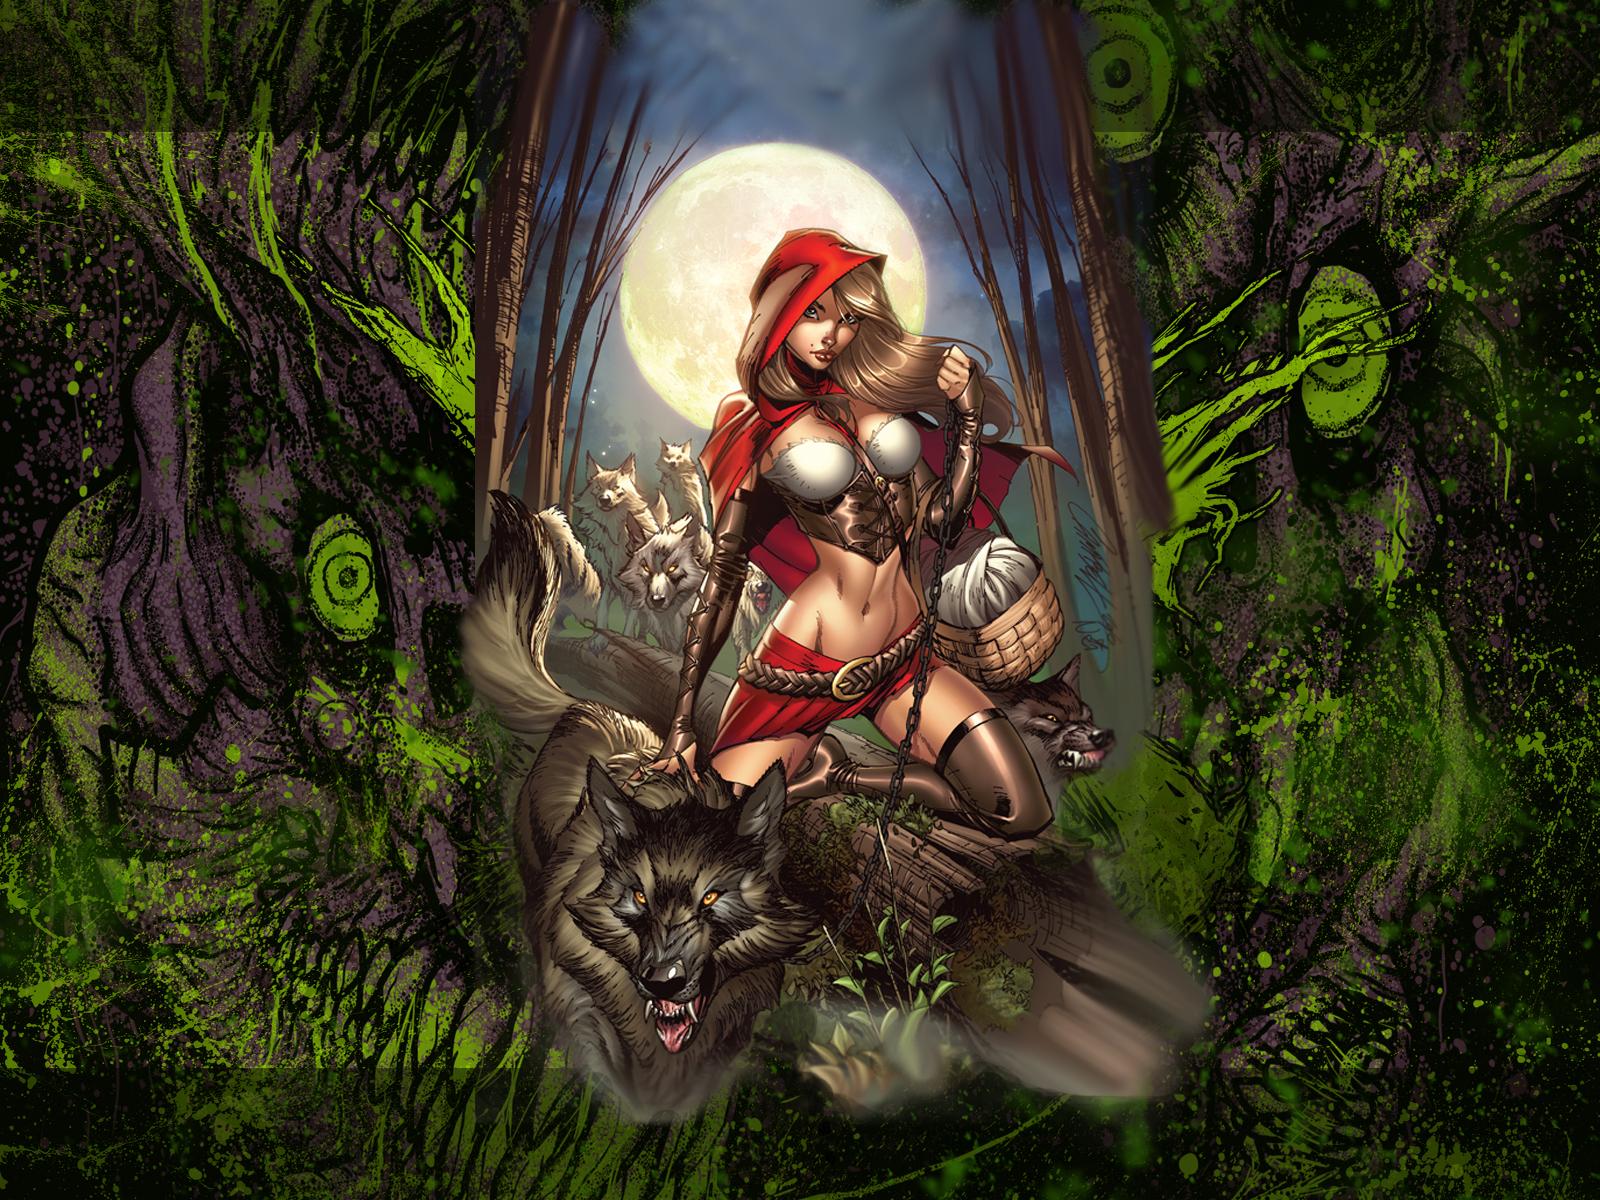 dark fairy tales wallpaper 56198 | bloghd